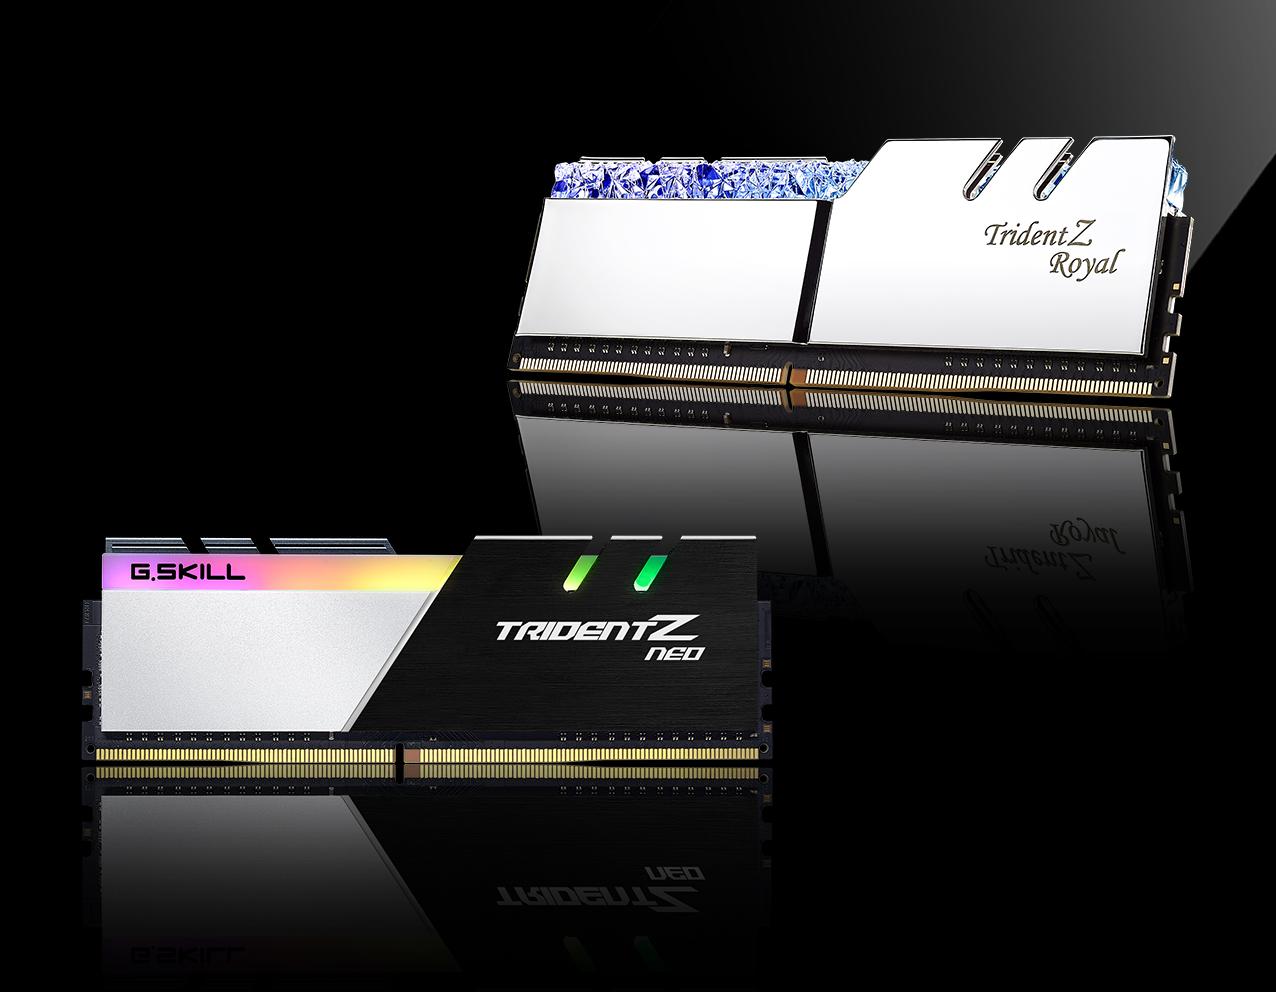 G.SKILL เปิดตัวแรม G.SKILL Trident Z Royal DDR4-3200 CL16 256GB รุ่นใหม่ล่าสุดและอีก 3รุ่นประสิทธิภาพสูงให้เลือกใช้งาน